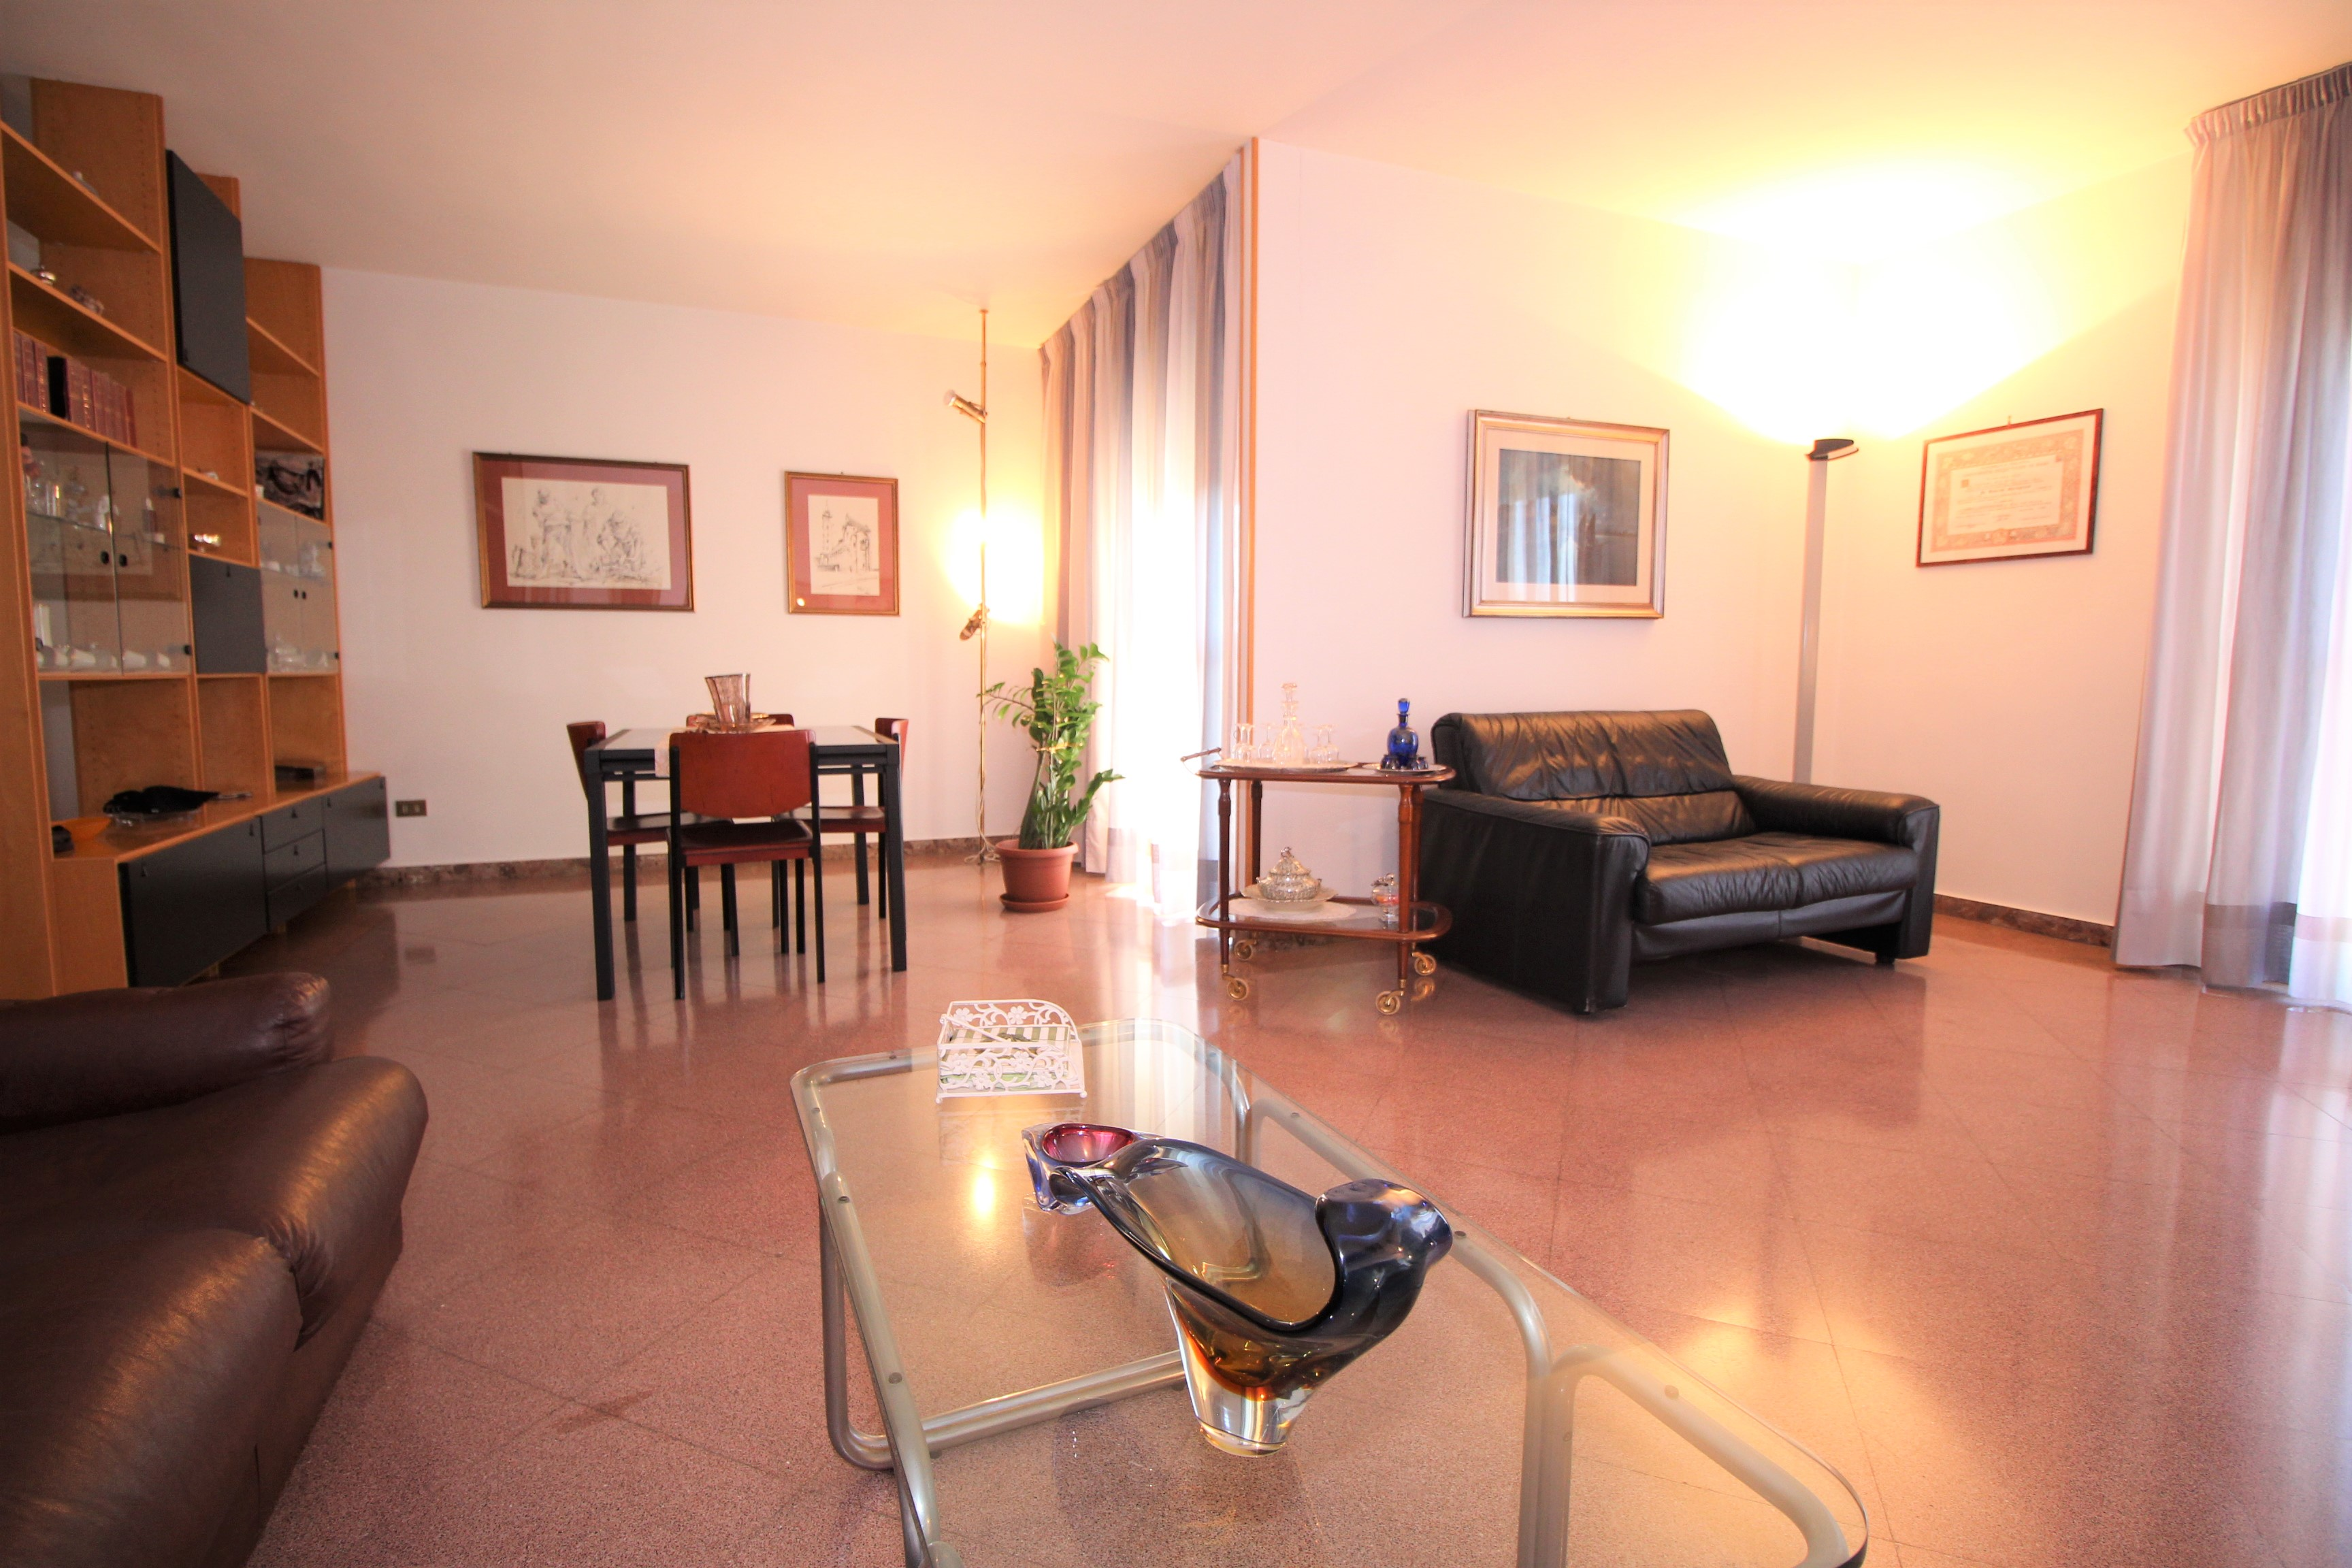 Bari , Japigia - ampio 5 vani con posto auto e cantina ...